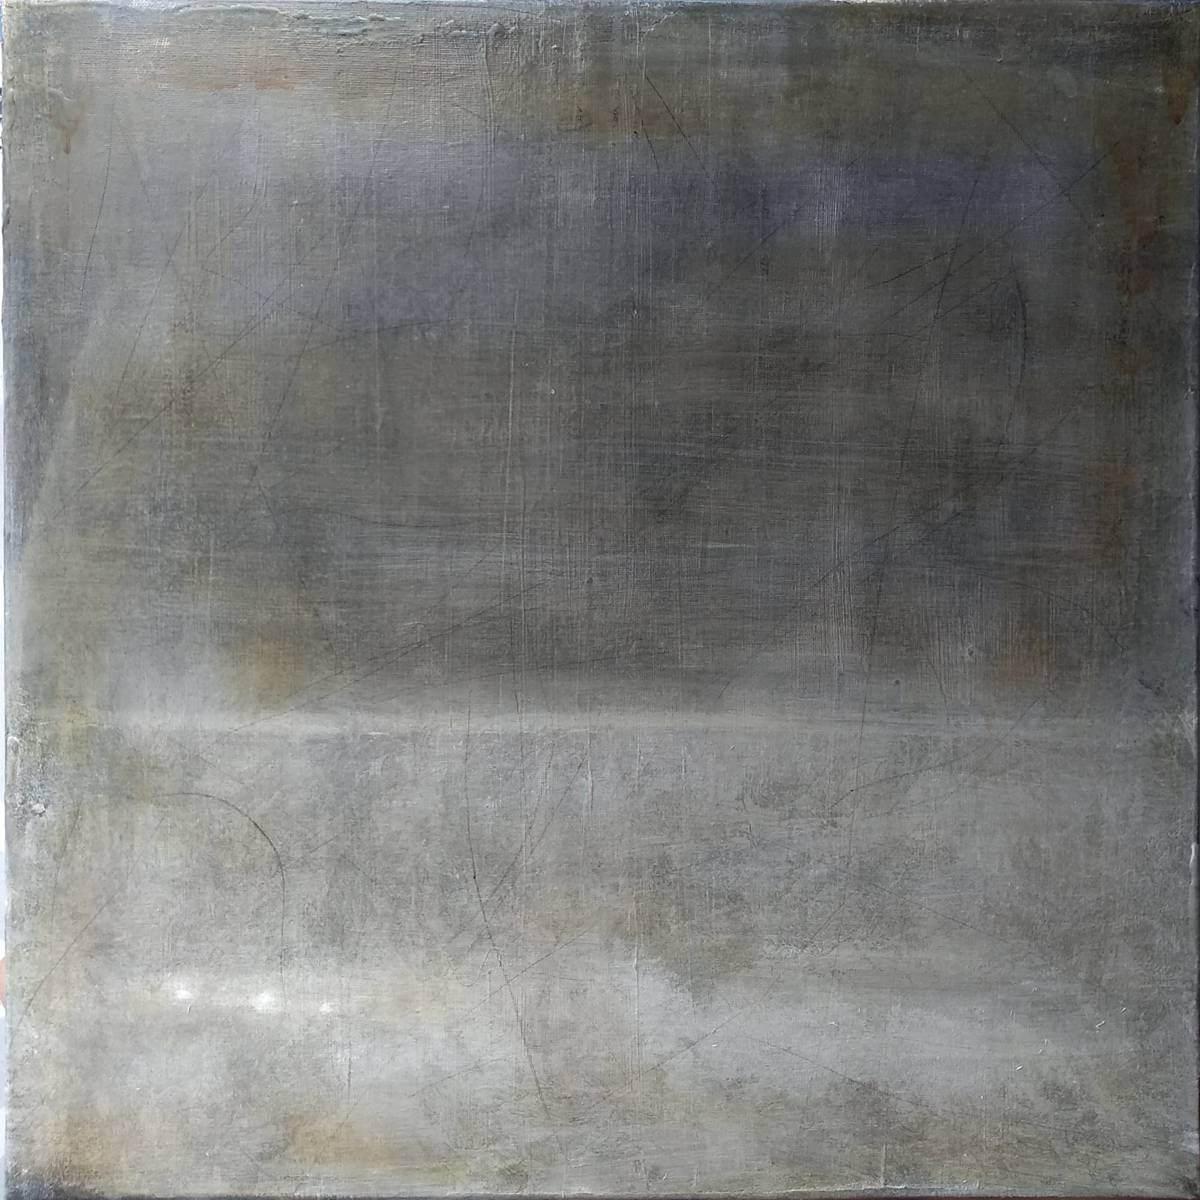 daniel-schuh-grunge-style-textur-contemporary-malerei